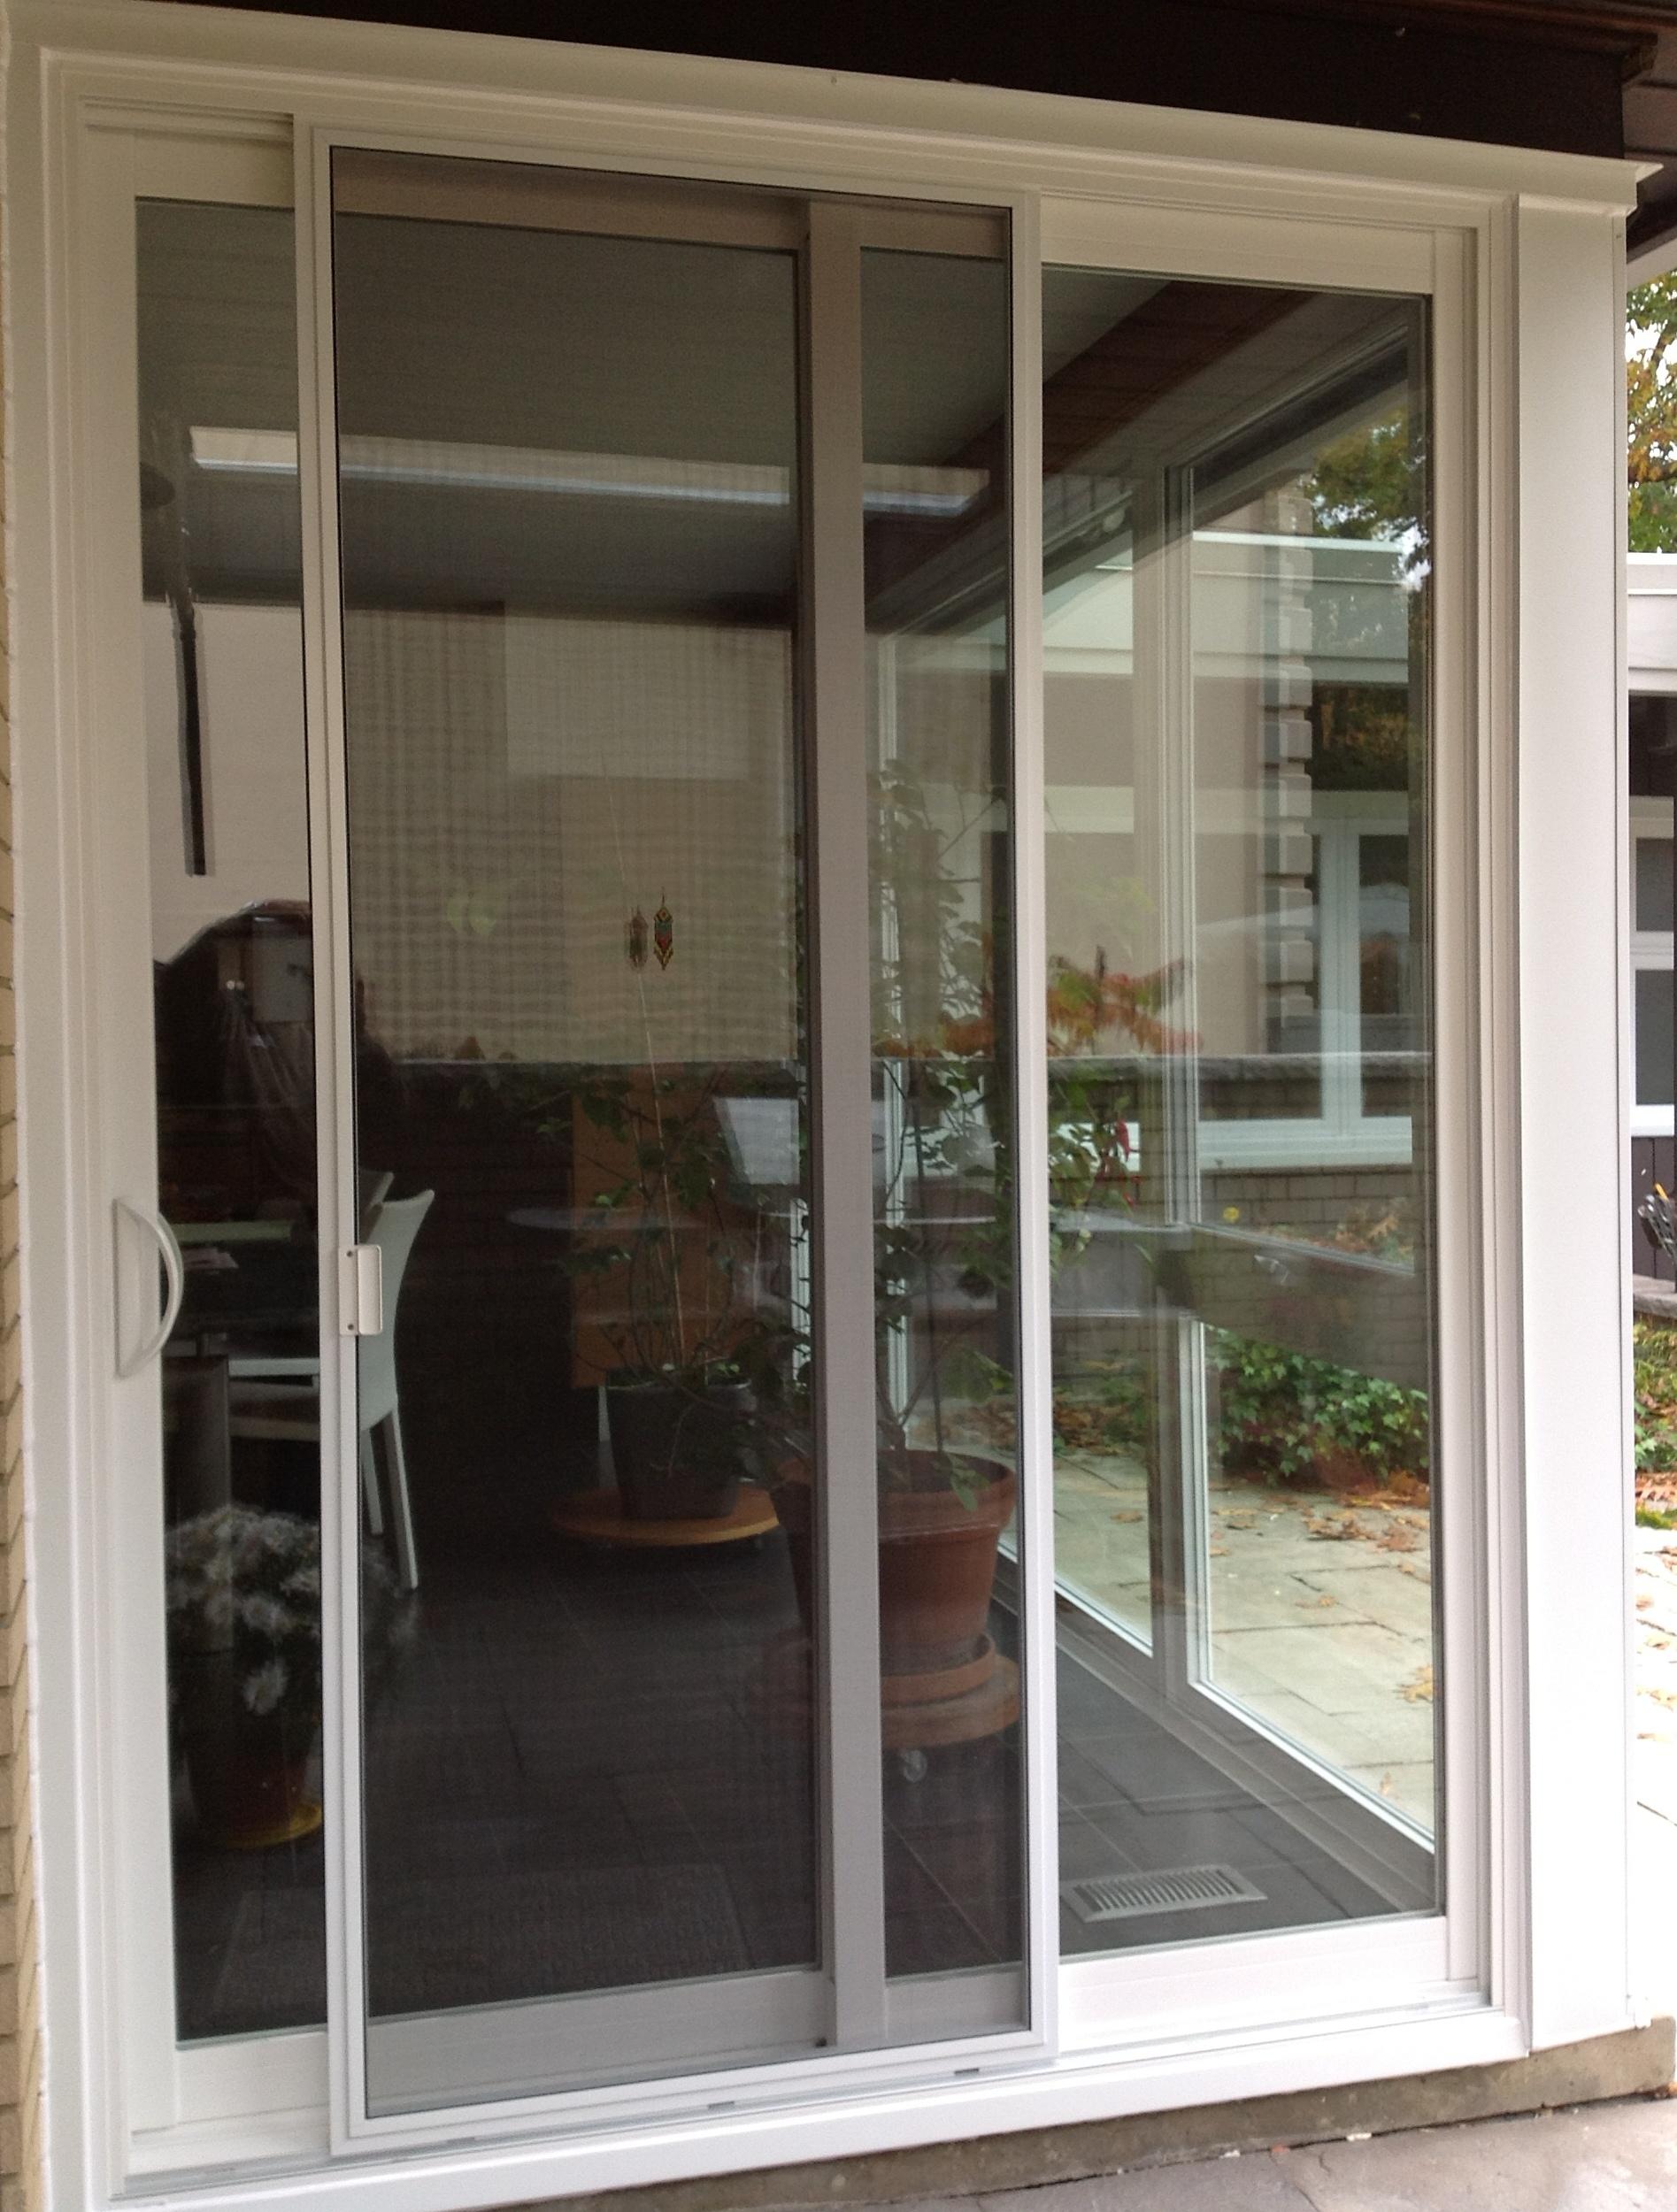 Sliding Screen Door For Apartment Balcony1895 X 2500